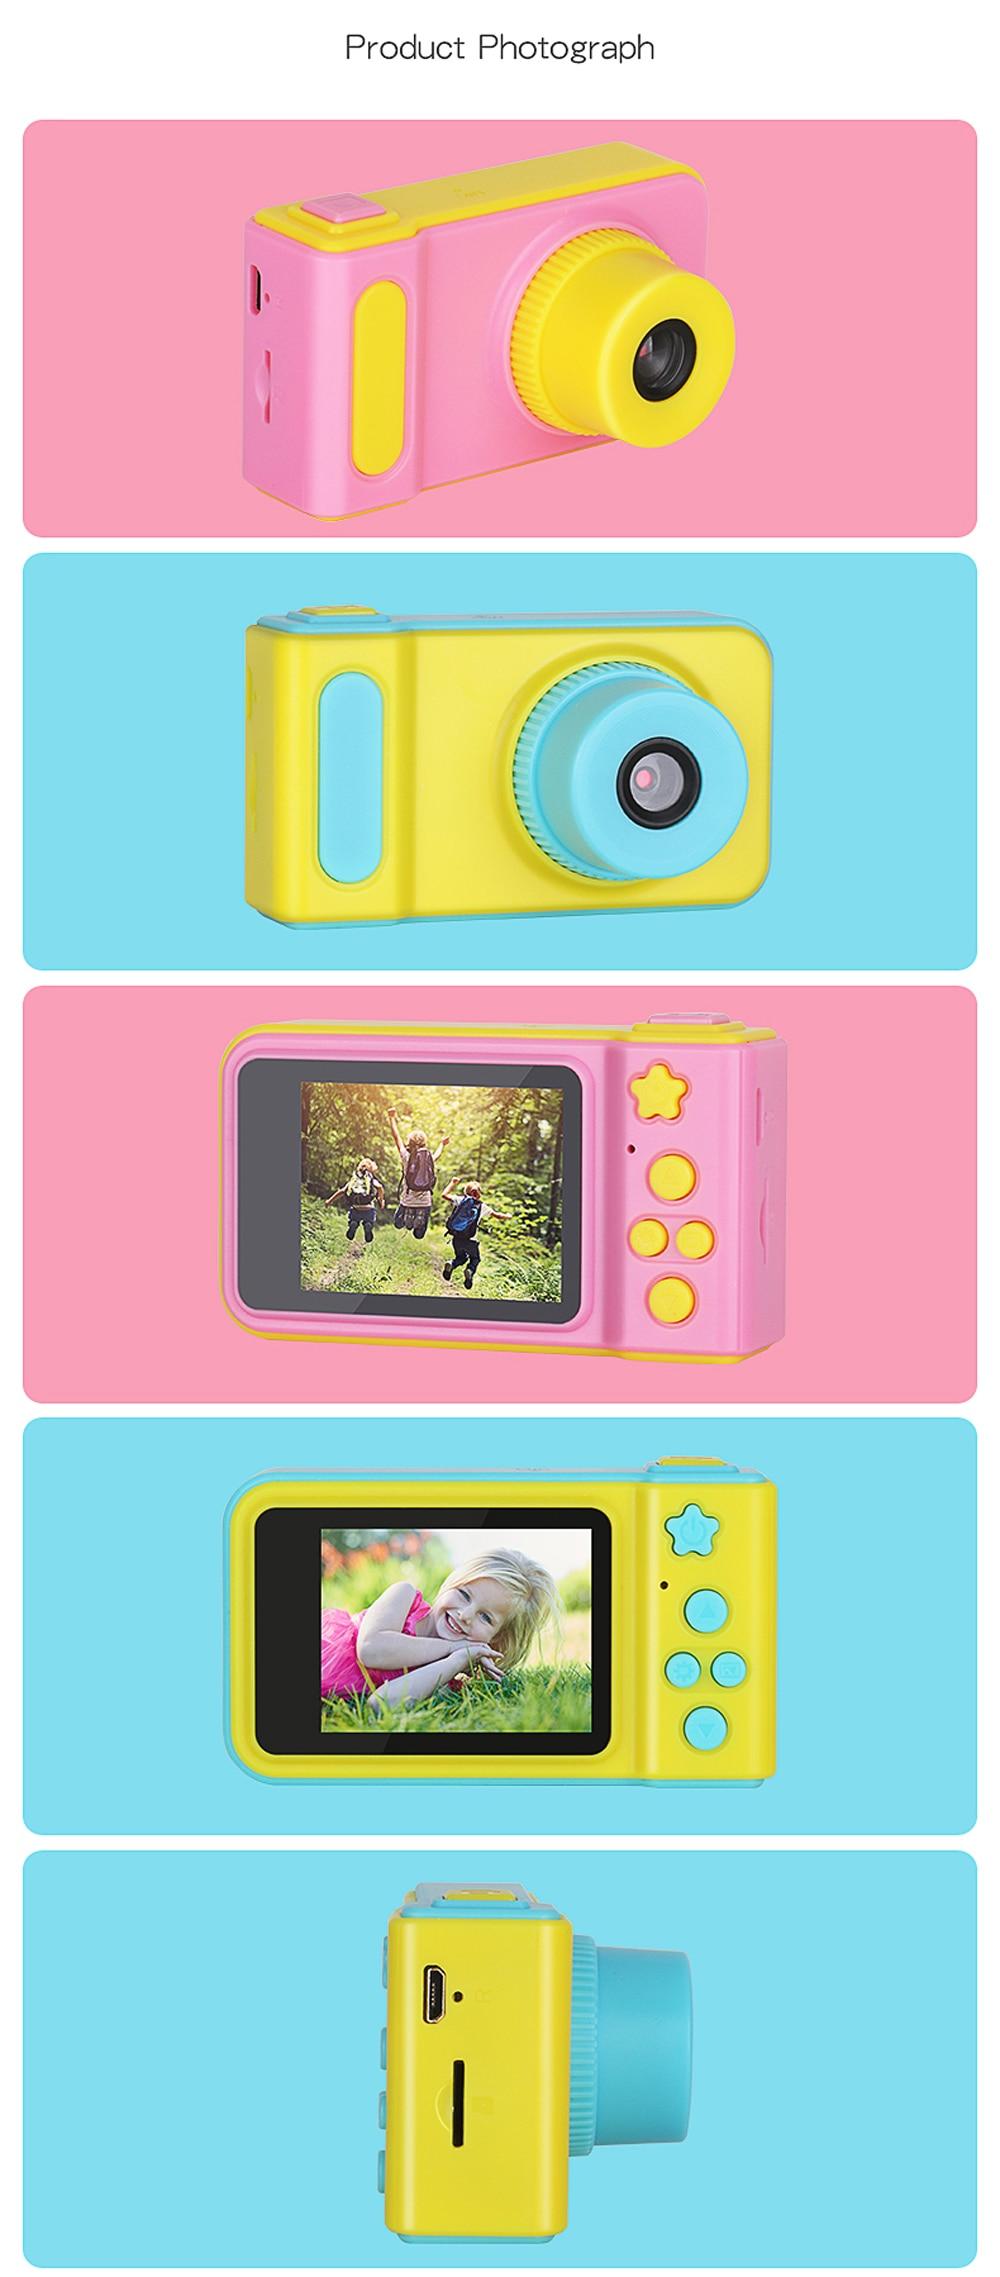 KOMERY Children's Digital Camera 2 Inch Screen Display Cartoon Cute Camera Birthday Gift 1080P Toddler Toys Video Camera For Ki